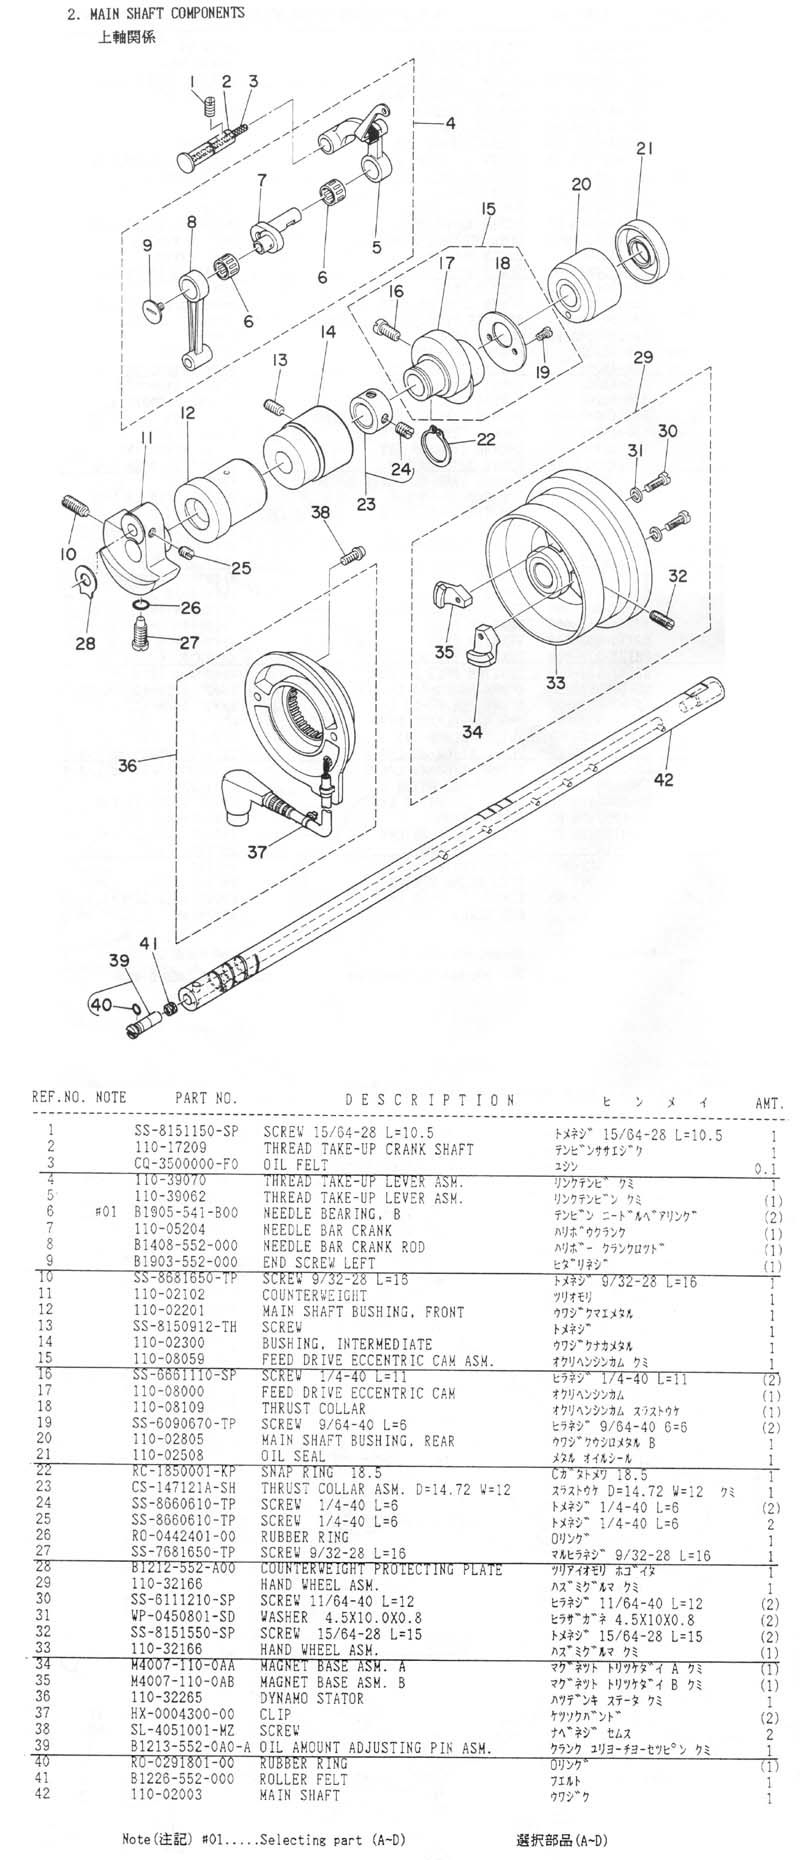 Treadle Sewing Machine Parts Diagram Radio Wiring Singer Pedal Diagrams Tariq Pinterest And Juki Rh Com Basic